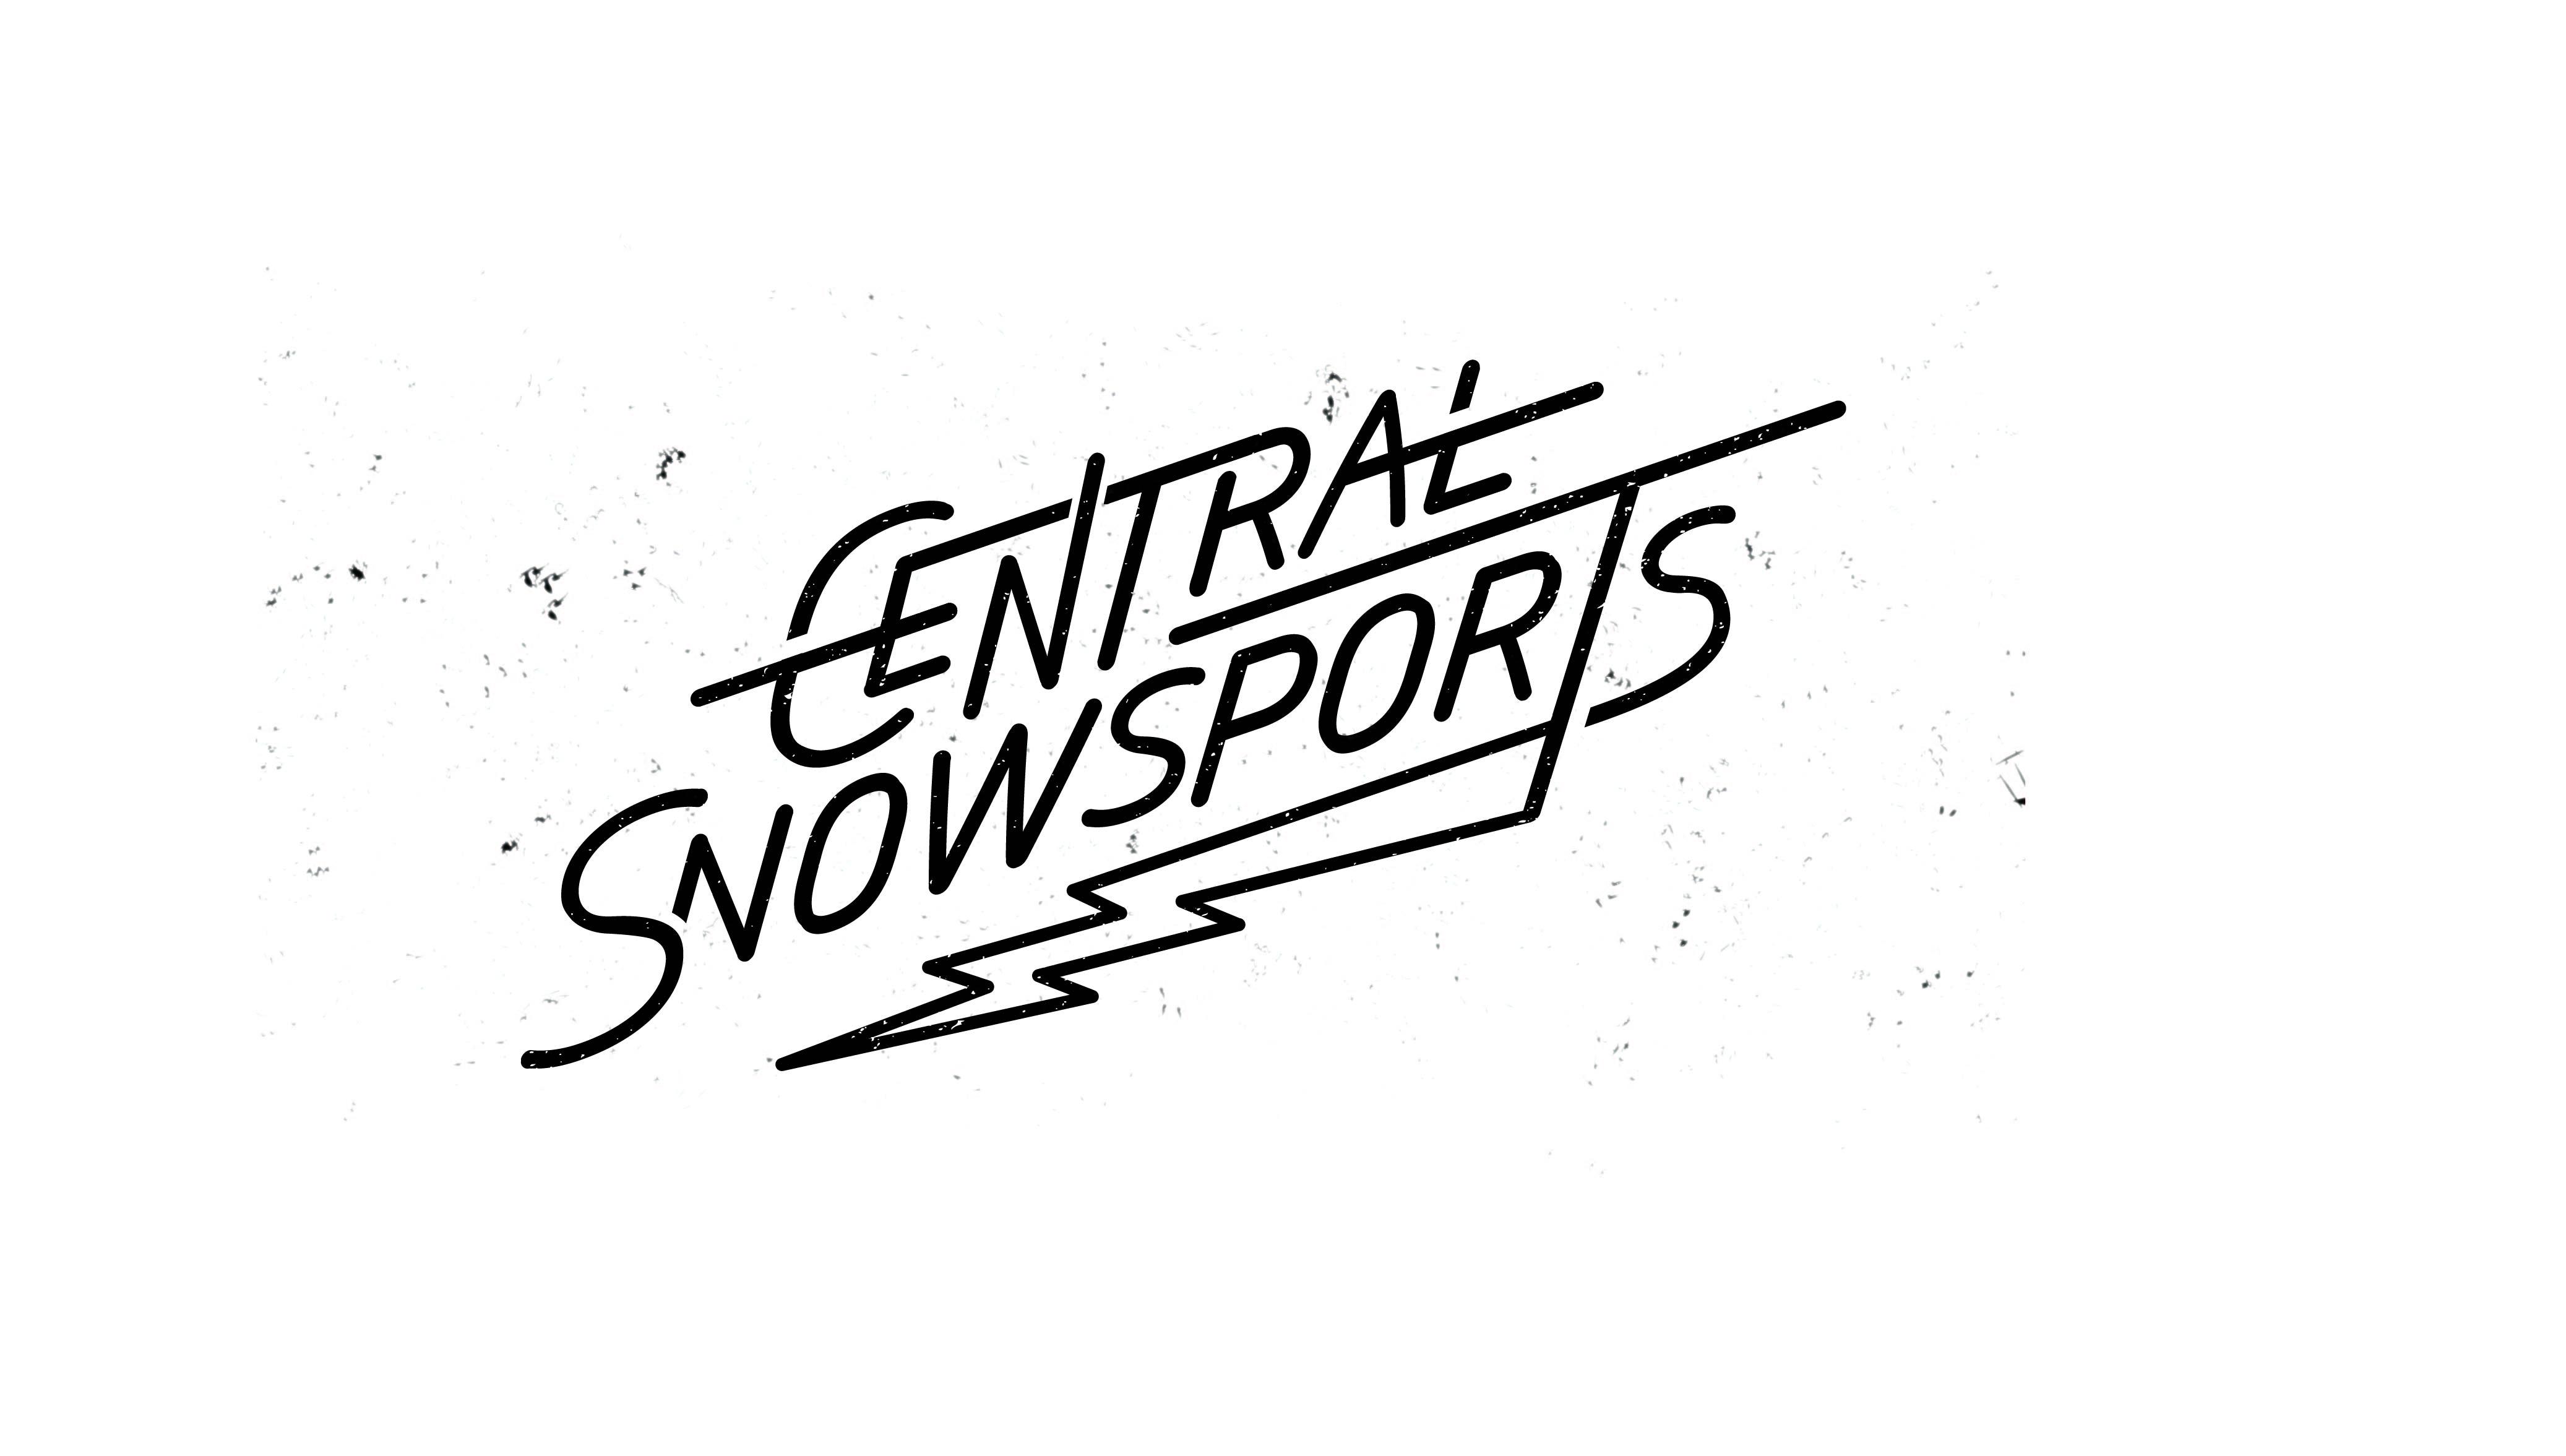 Central Snow sports graphic desinger